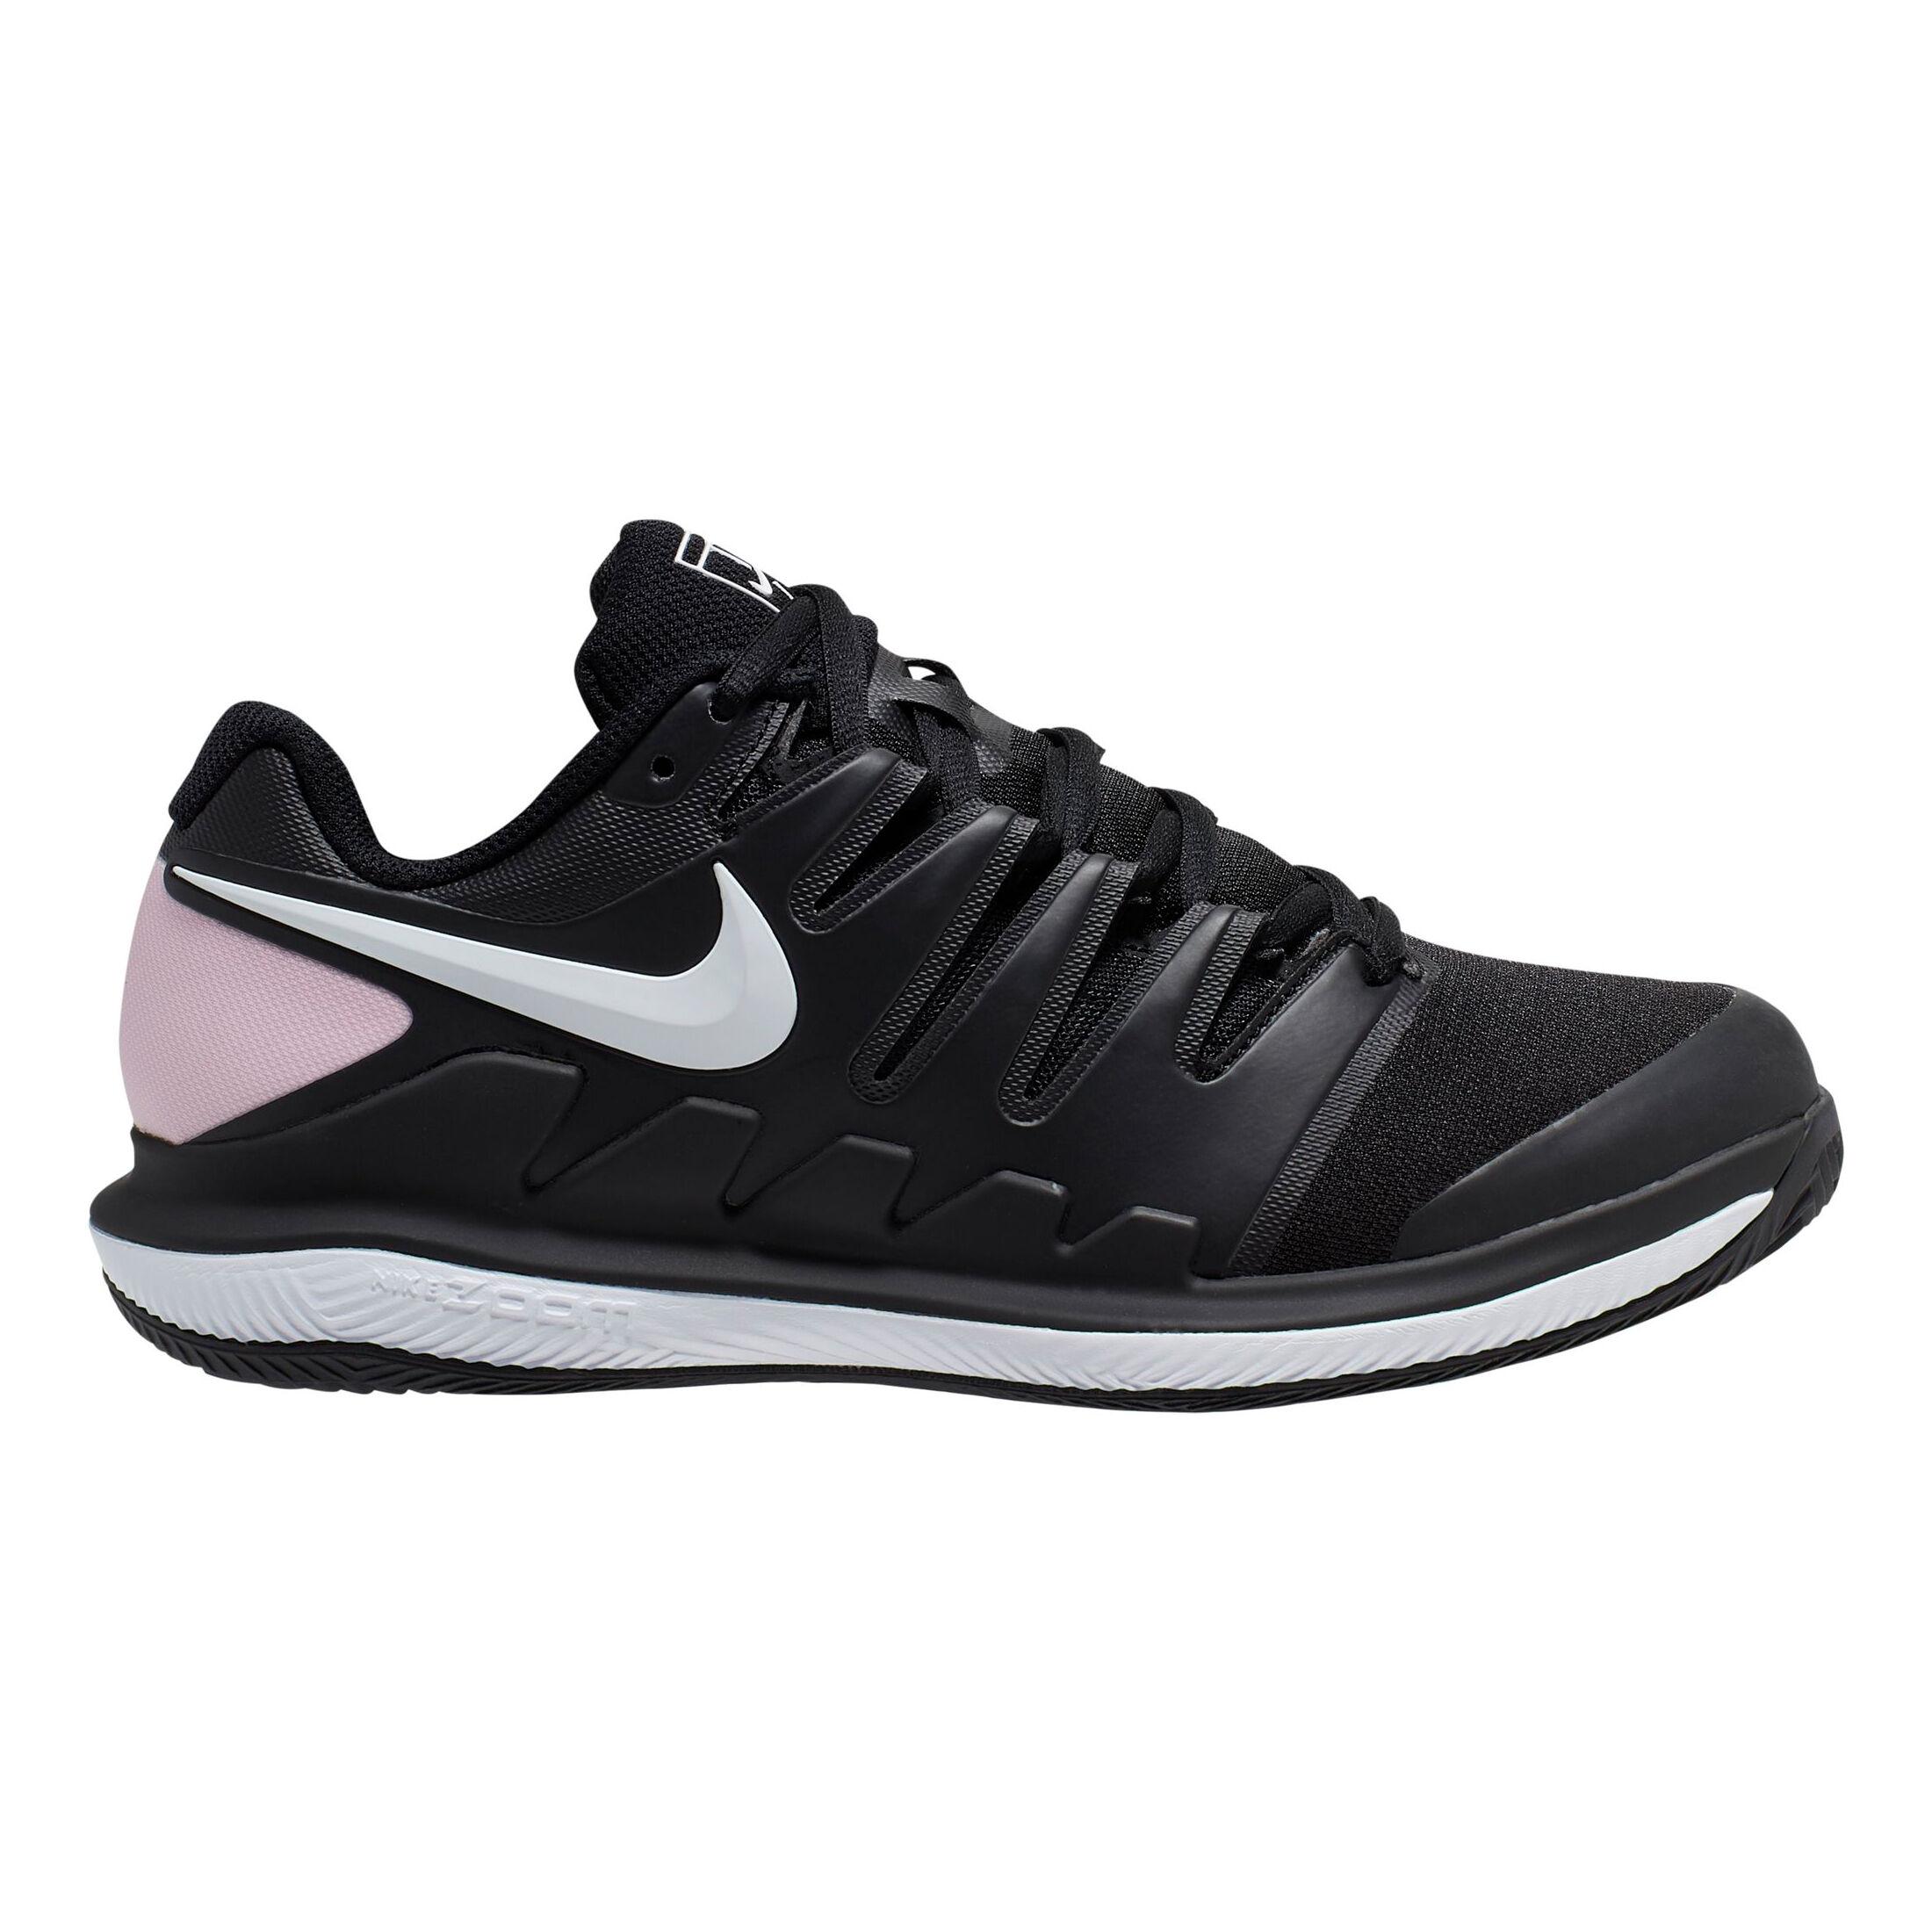 Nike Air Zoom Vapor X Clay Gravelschoen Dames - Zwart, Wit